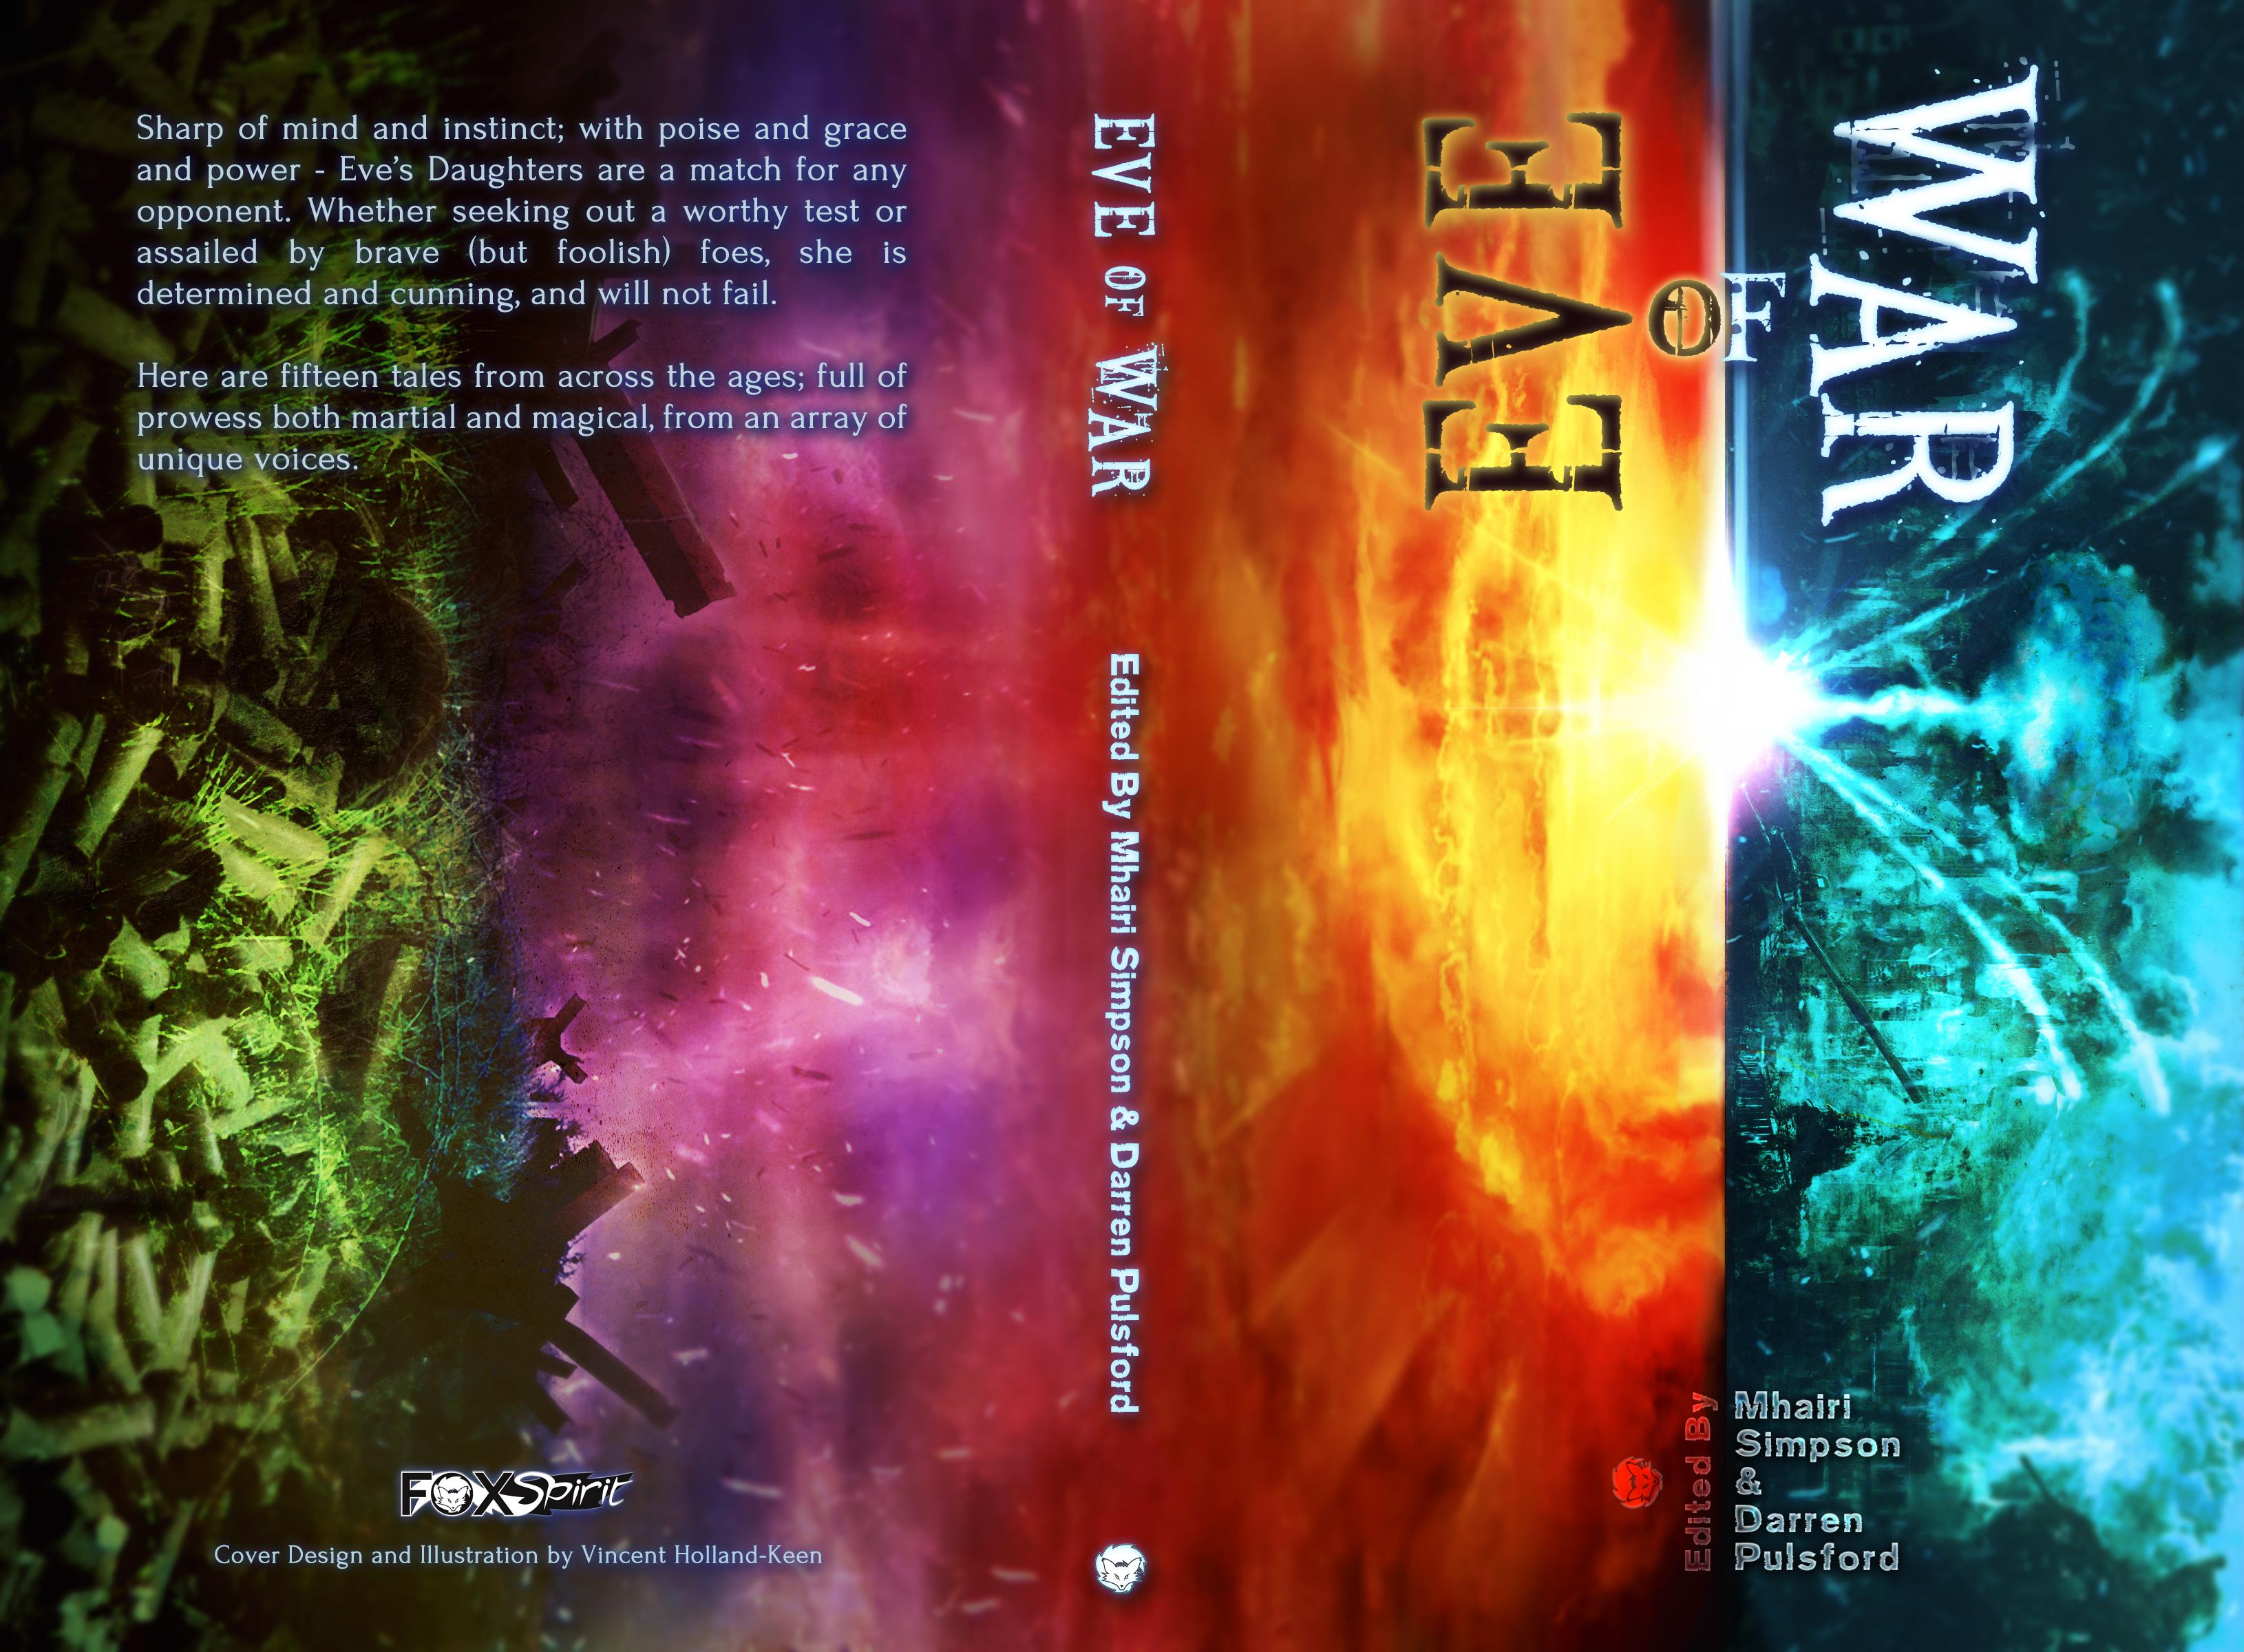 Eve of War edited by Darren Pulsford & Mhairi Simpson